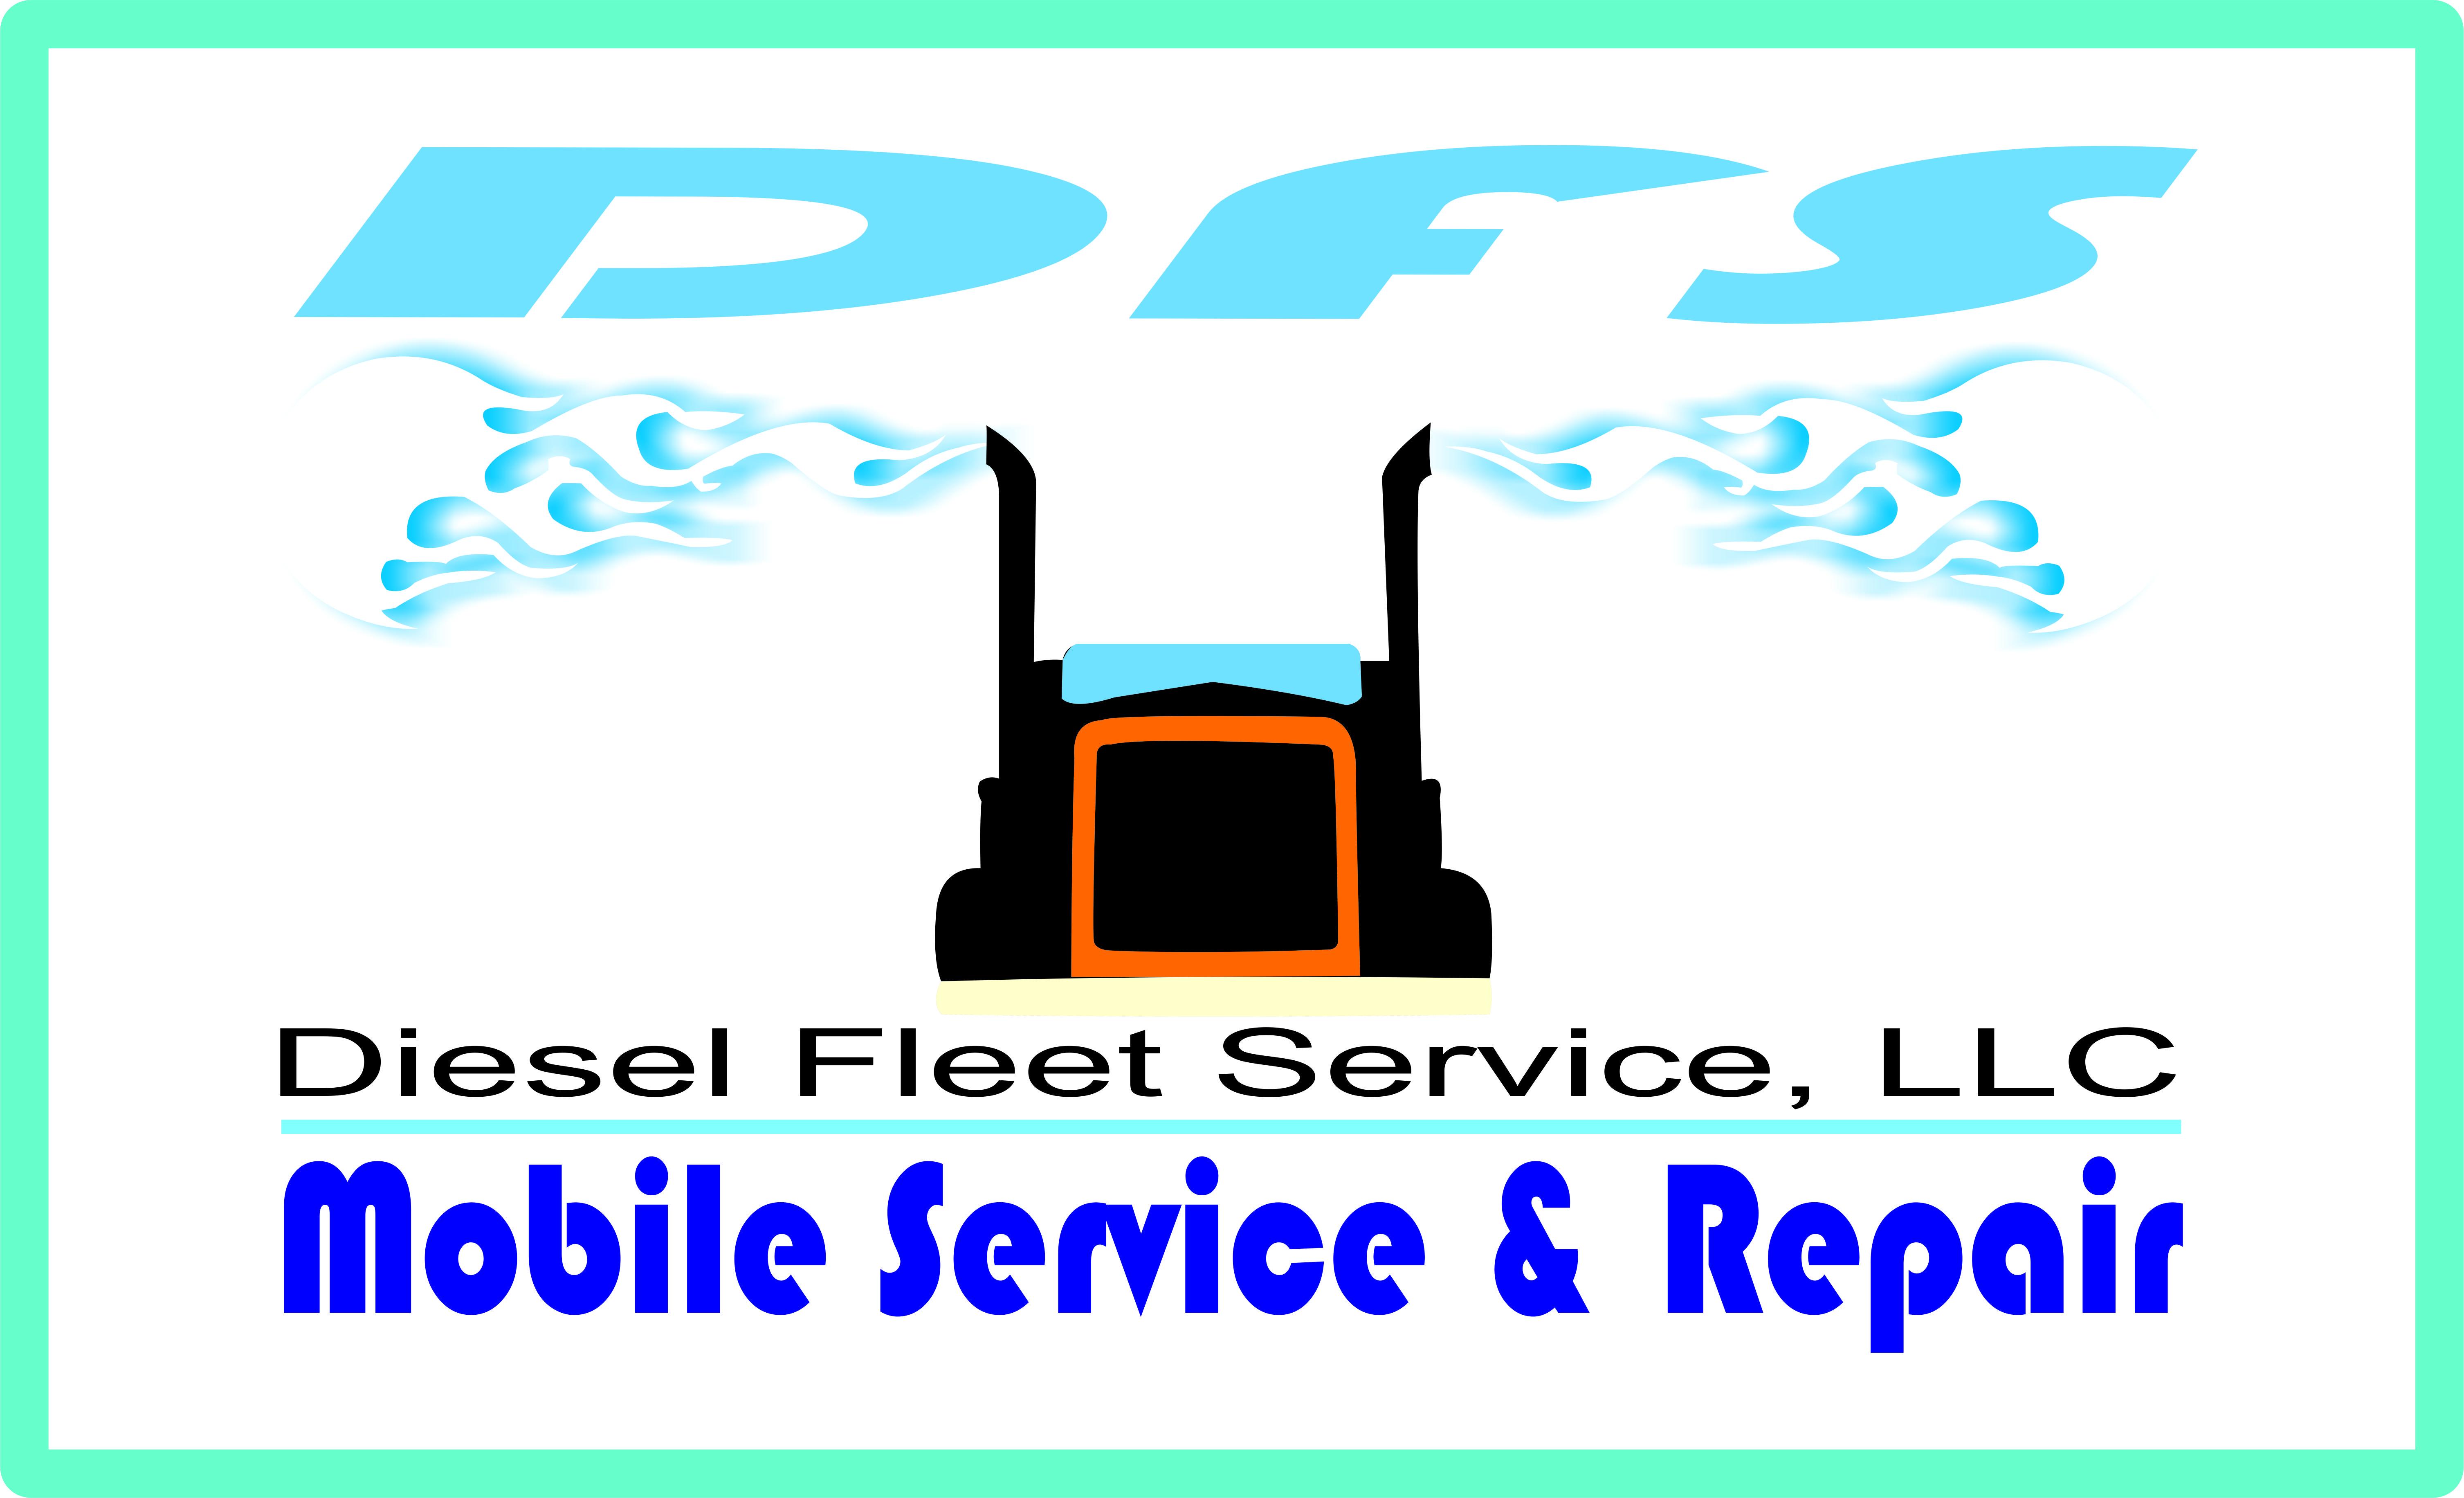 Logo Design by Teguh Hanuraga - Entry No. 32 in the Logo Design Contest Artistic Logo Design for Diesel Fleet Service, LLC.